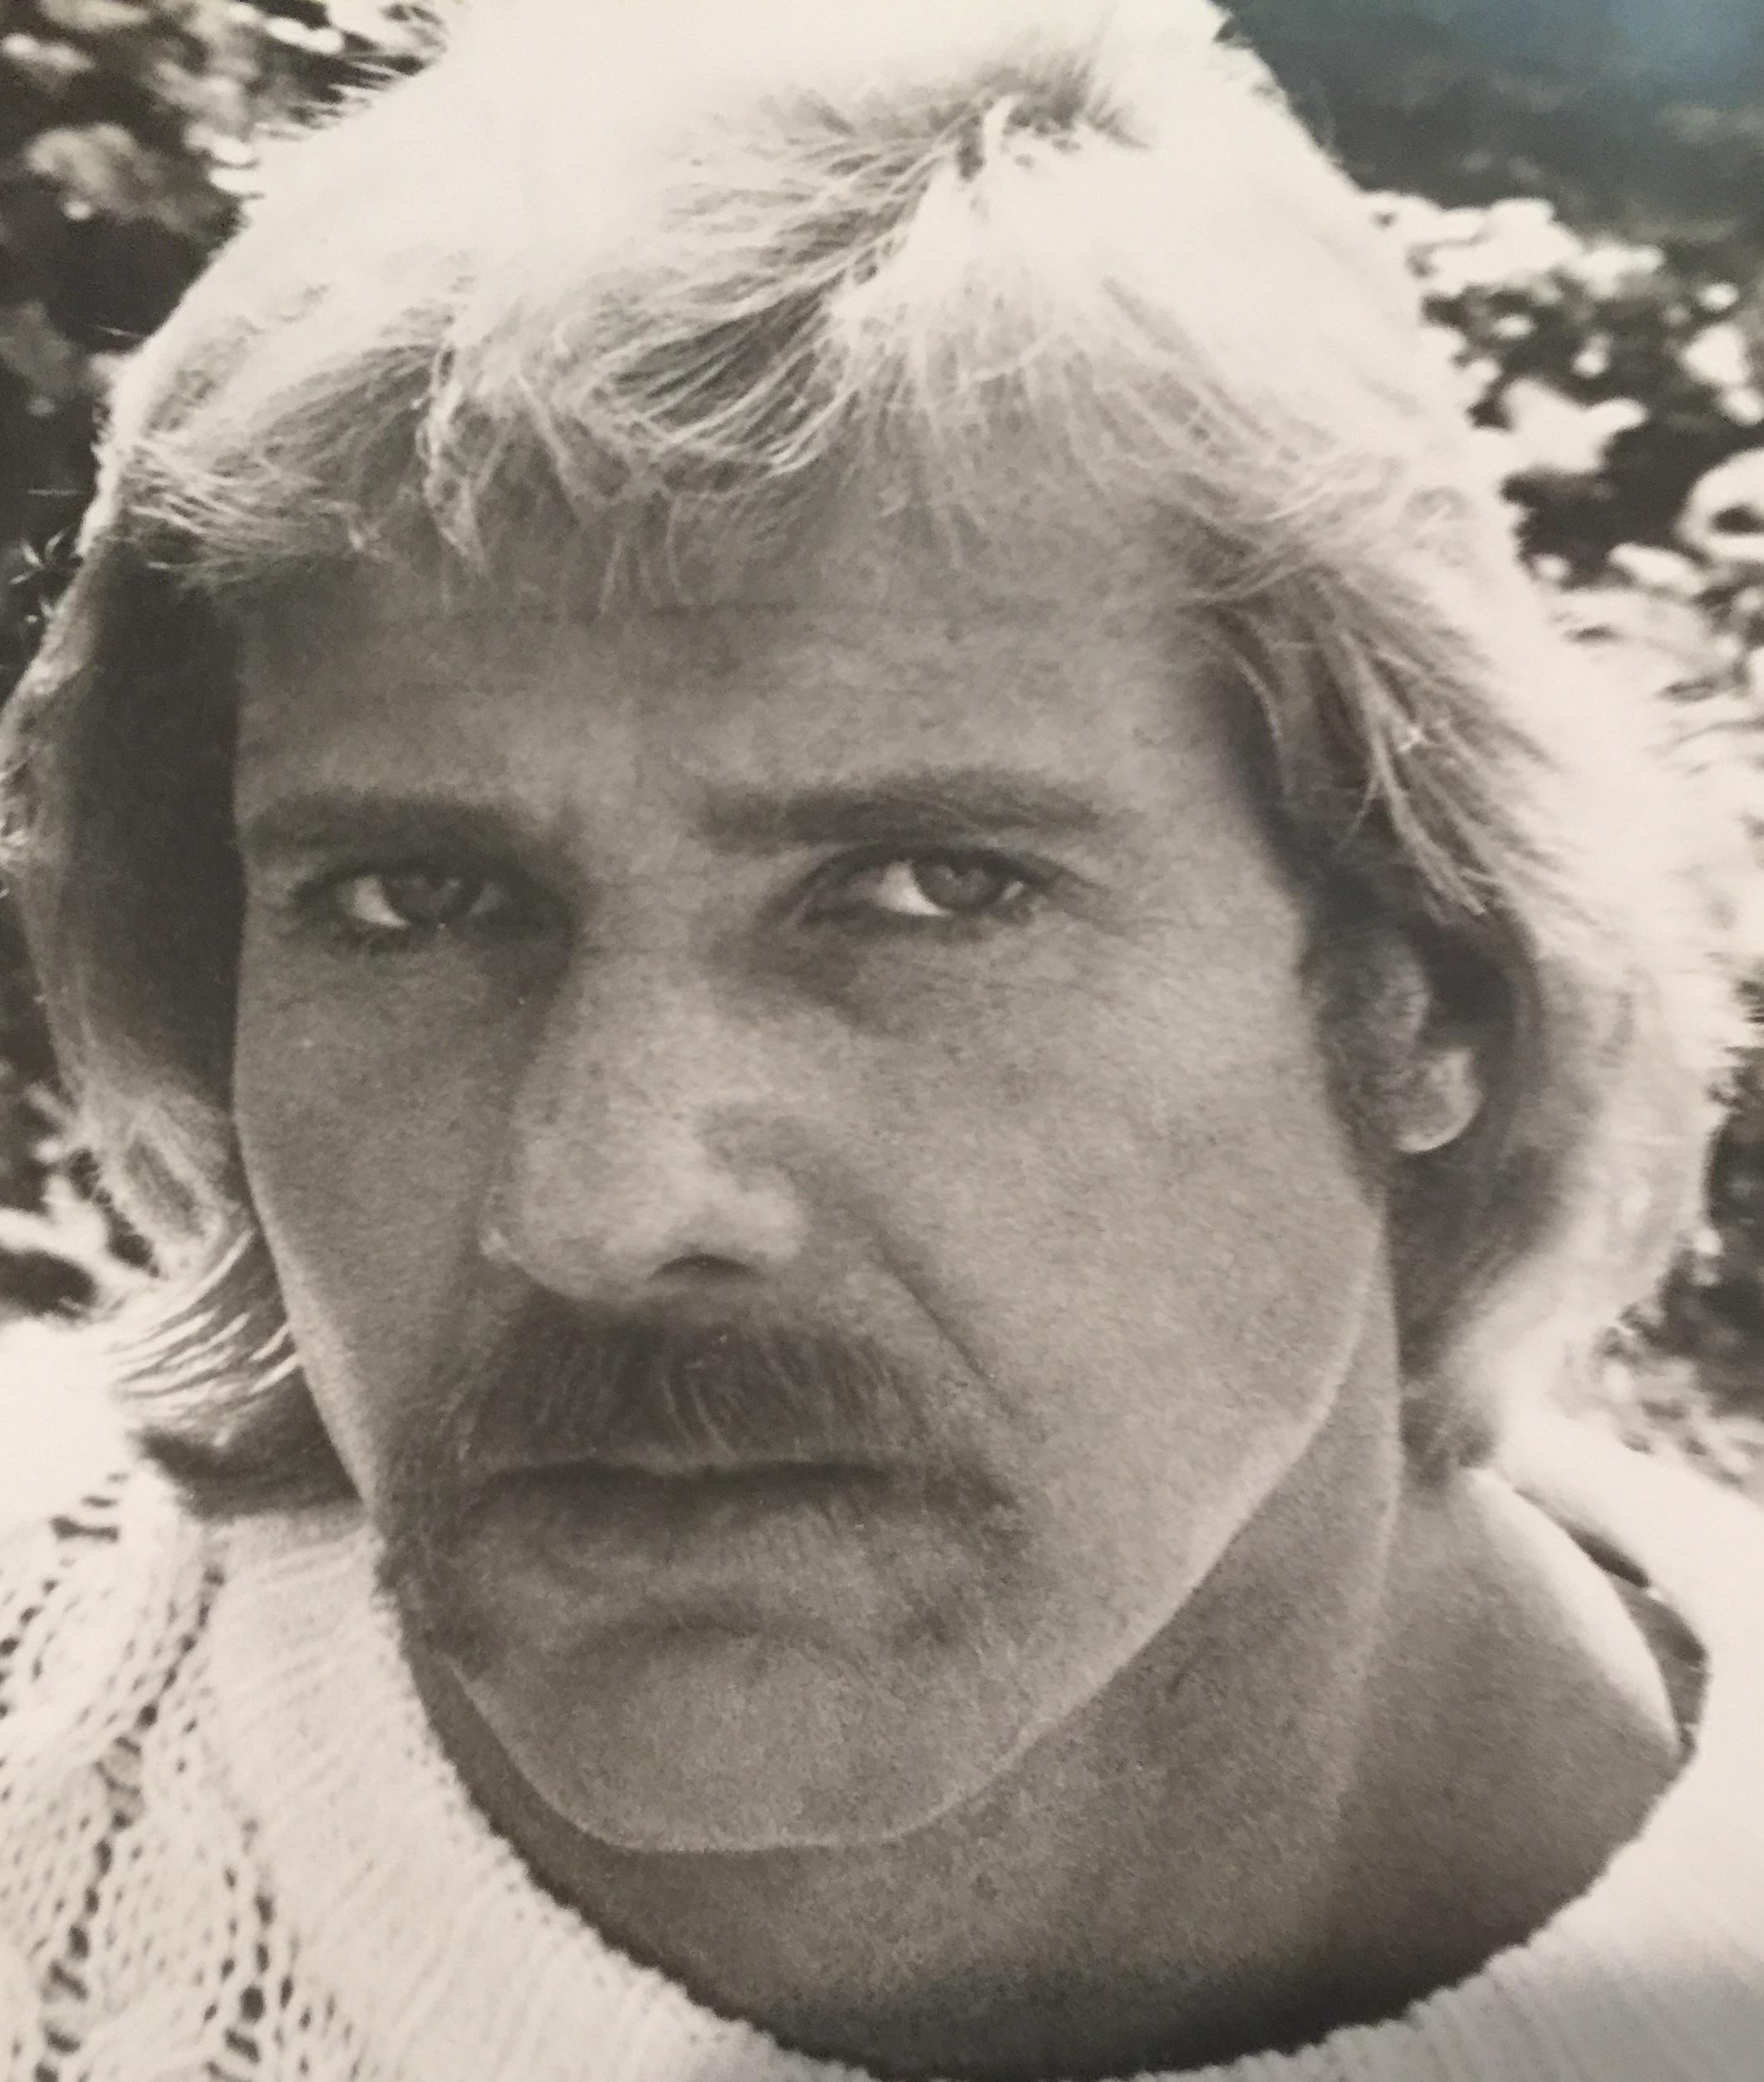 David Smith in Lucky Stiff (1988)